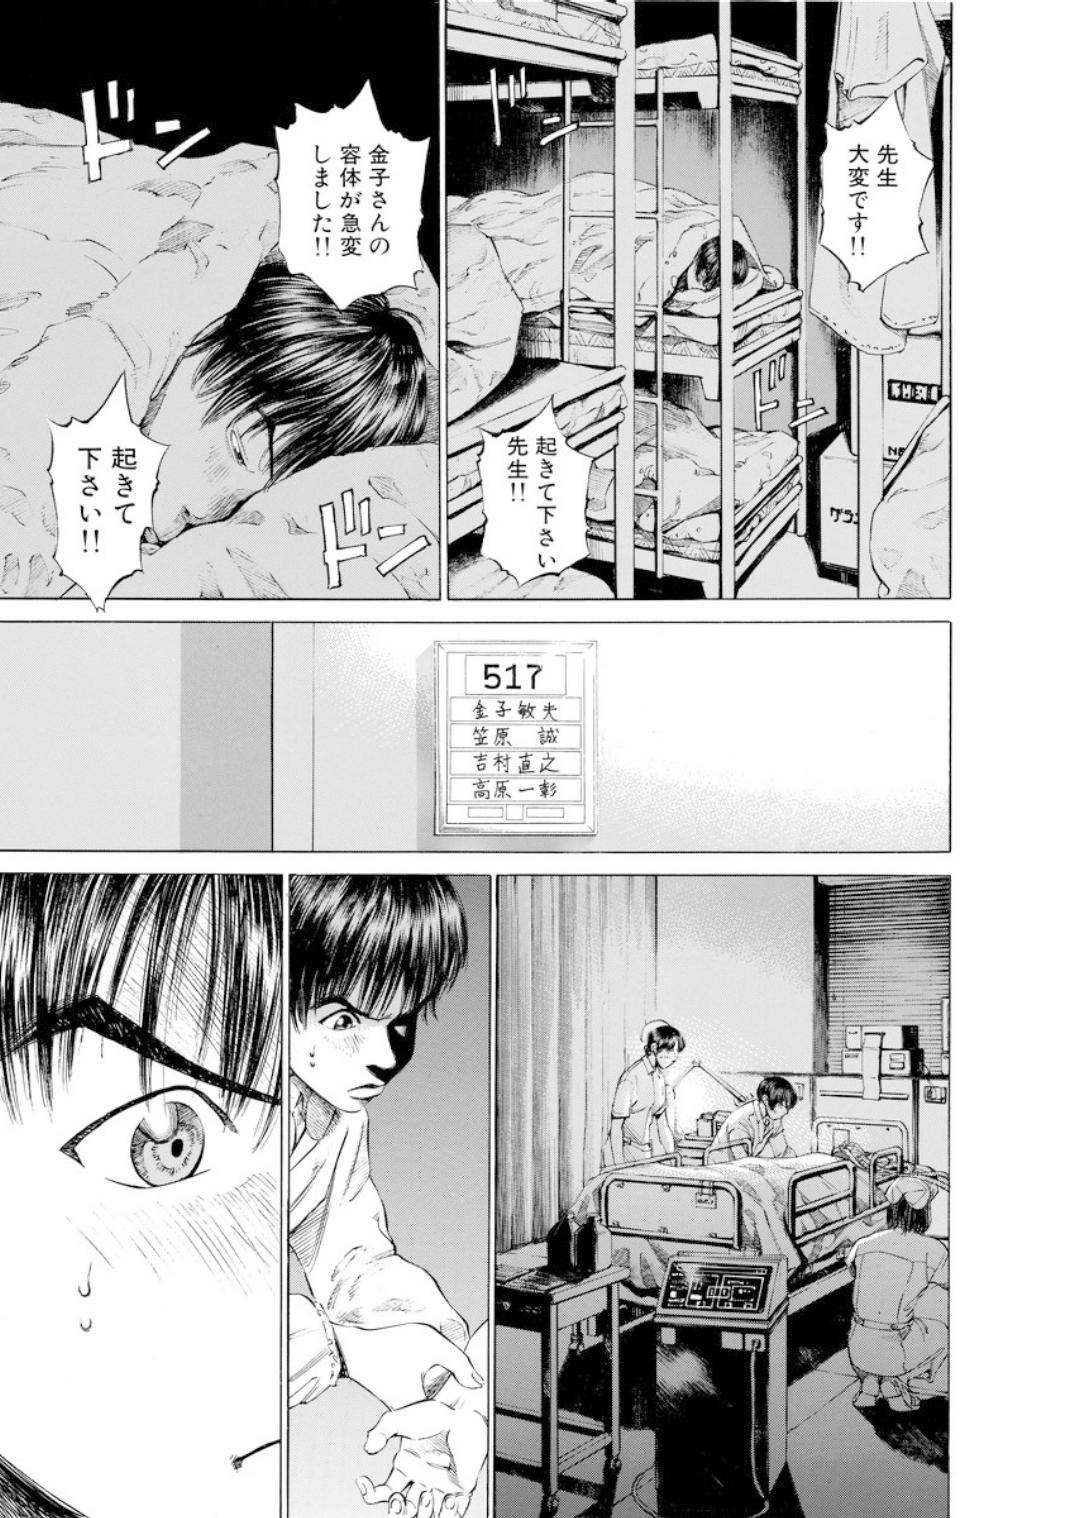 001bj_page-0107.jpg